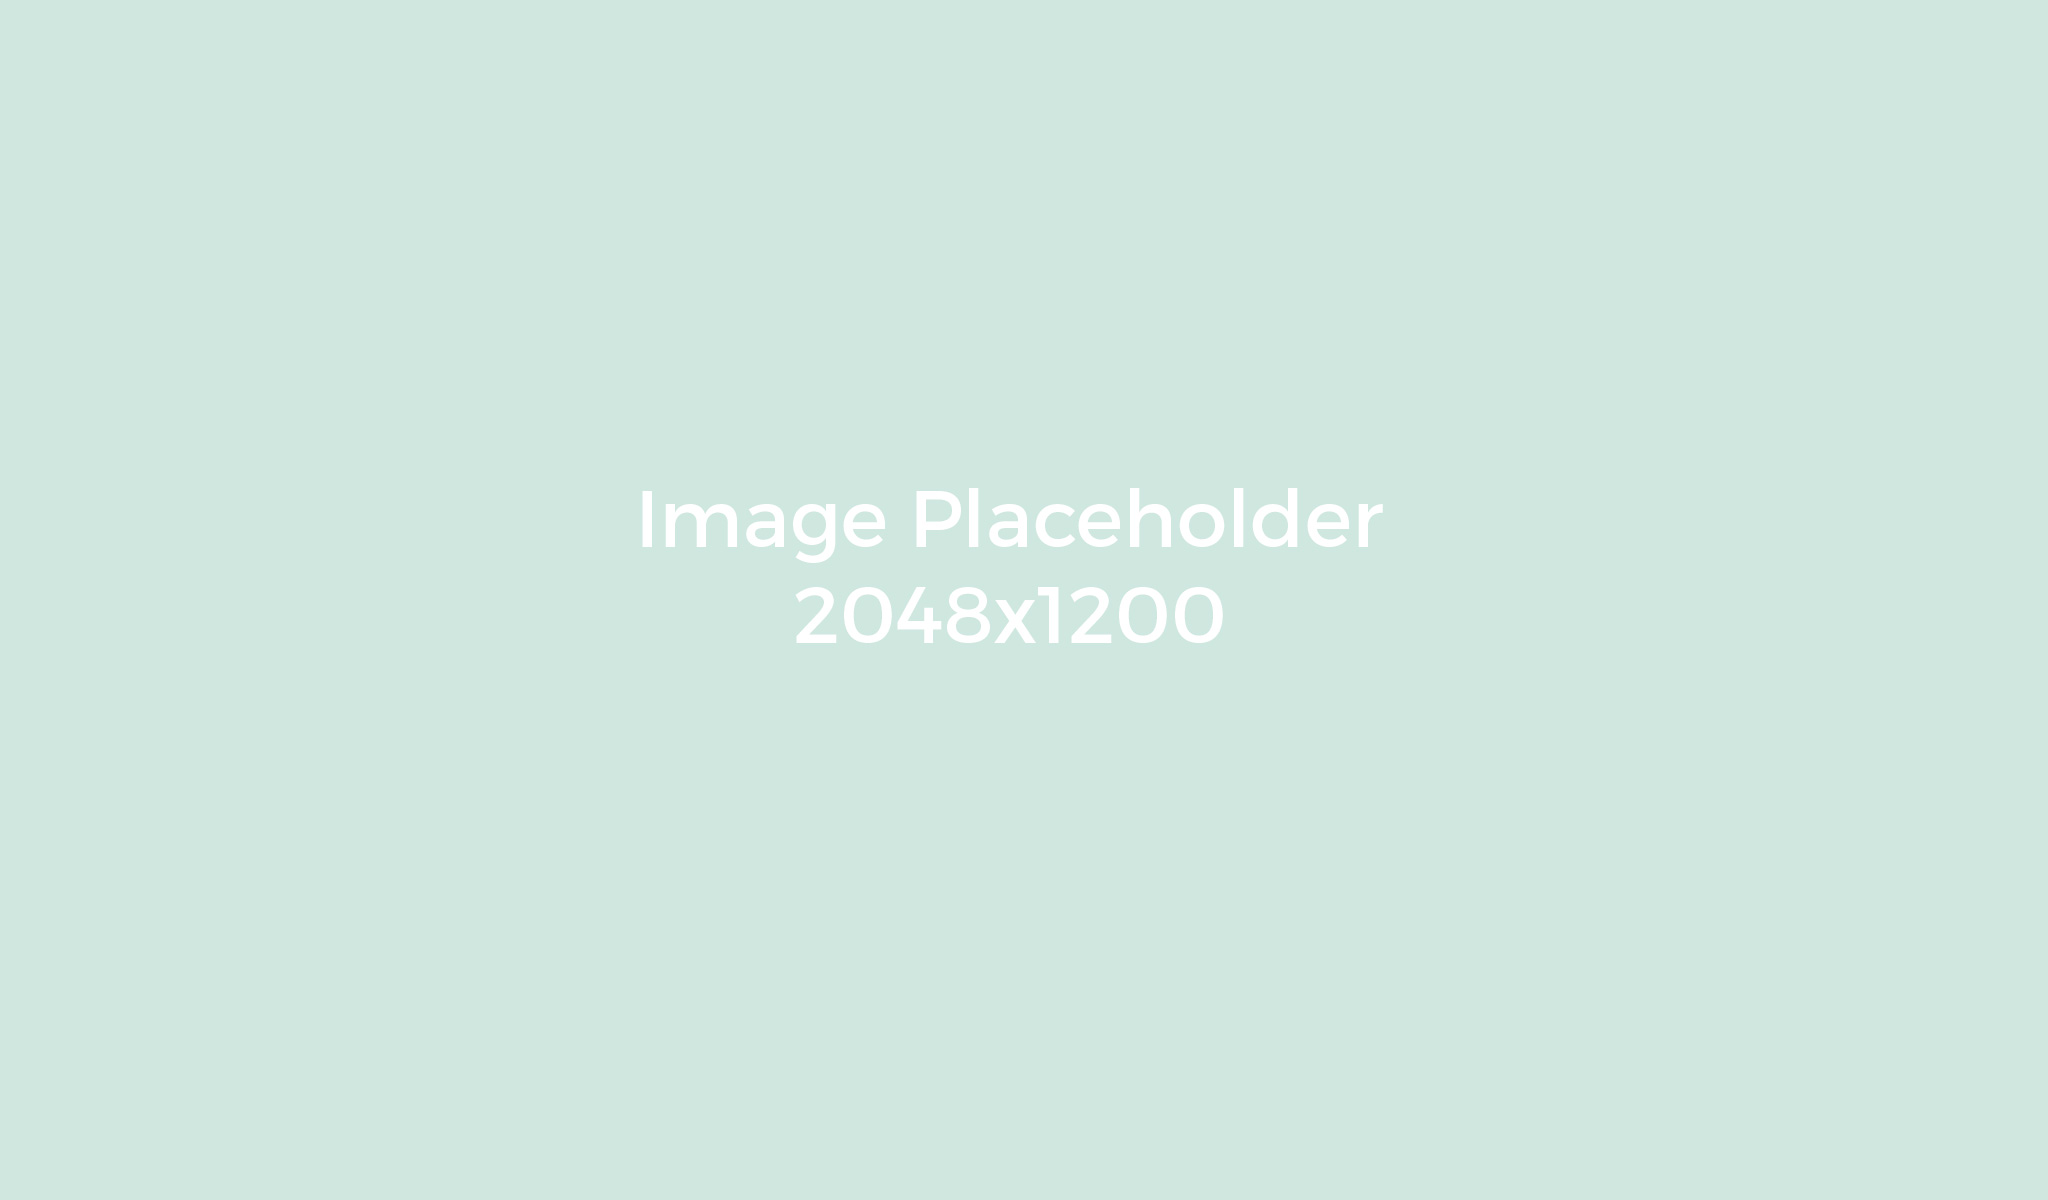 Placeholder_2048x1200jpg